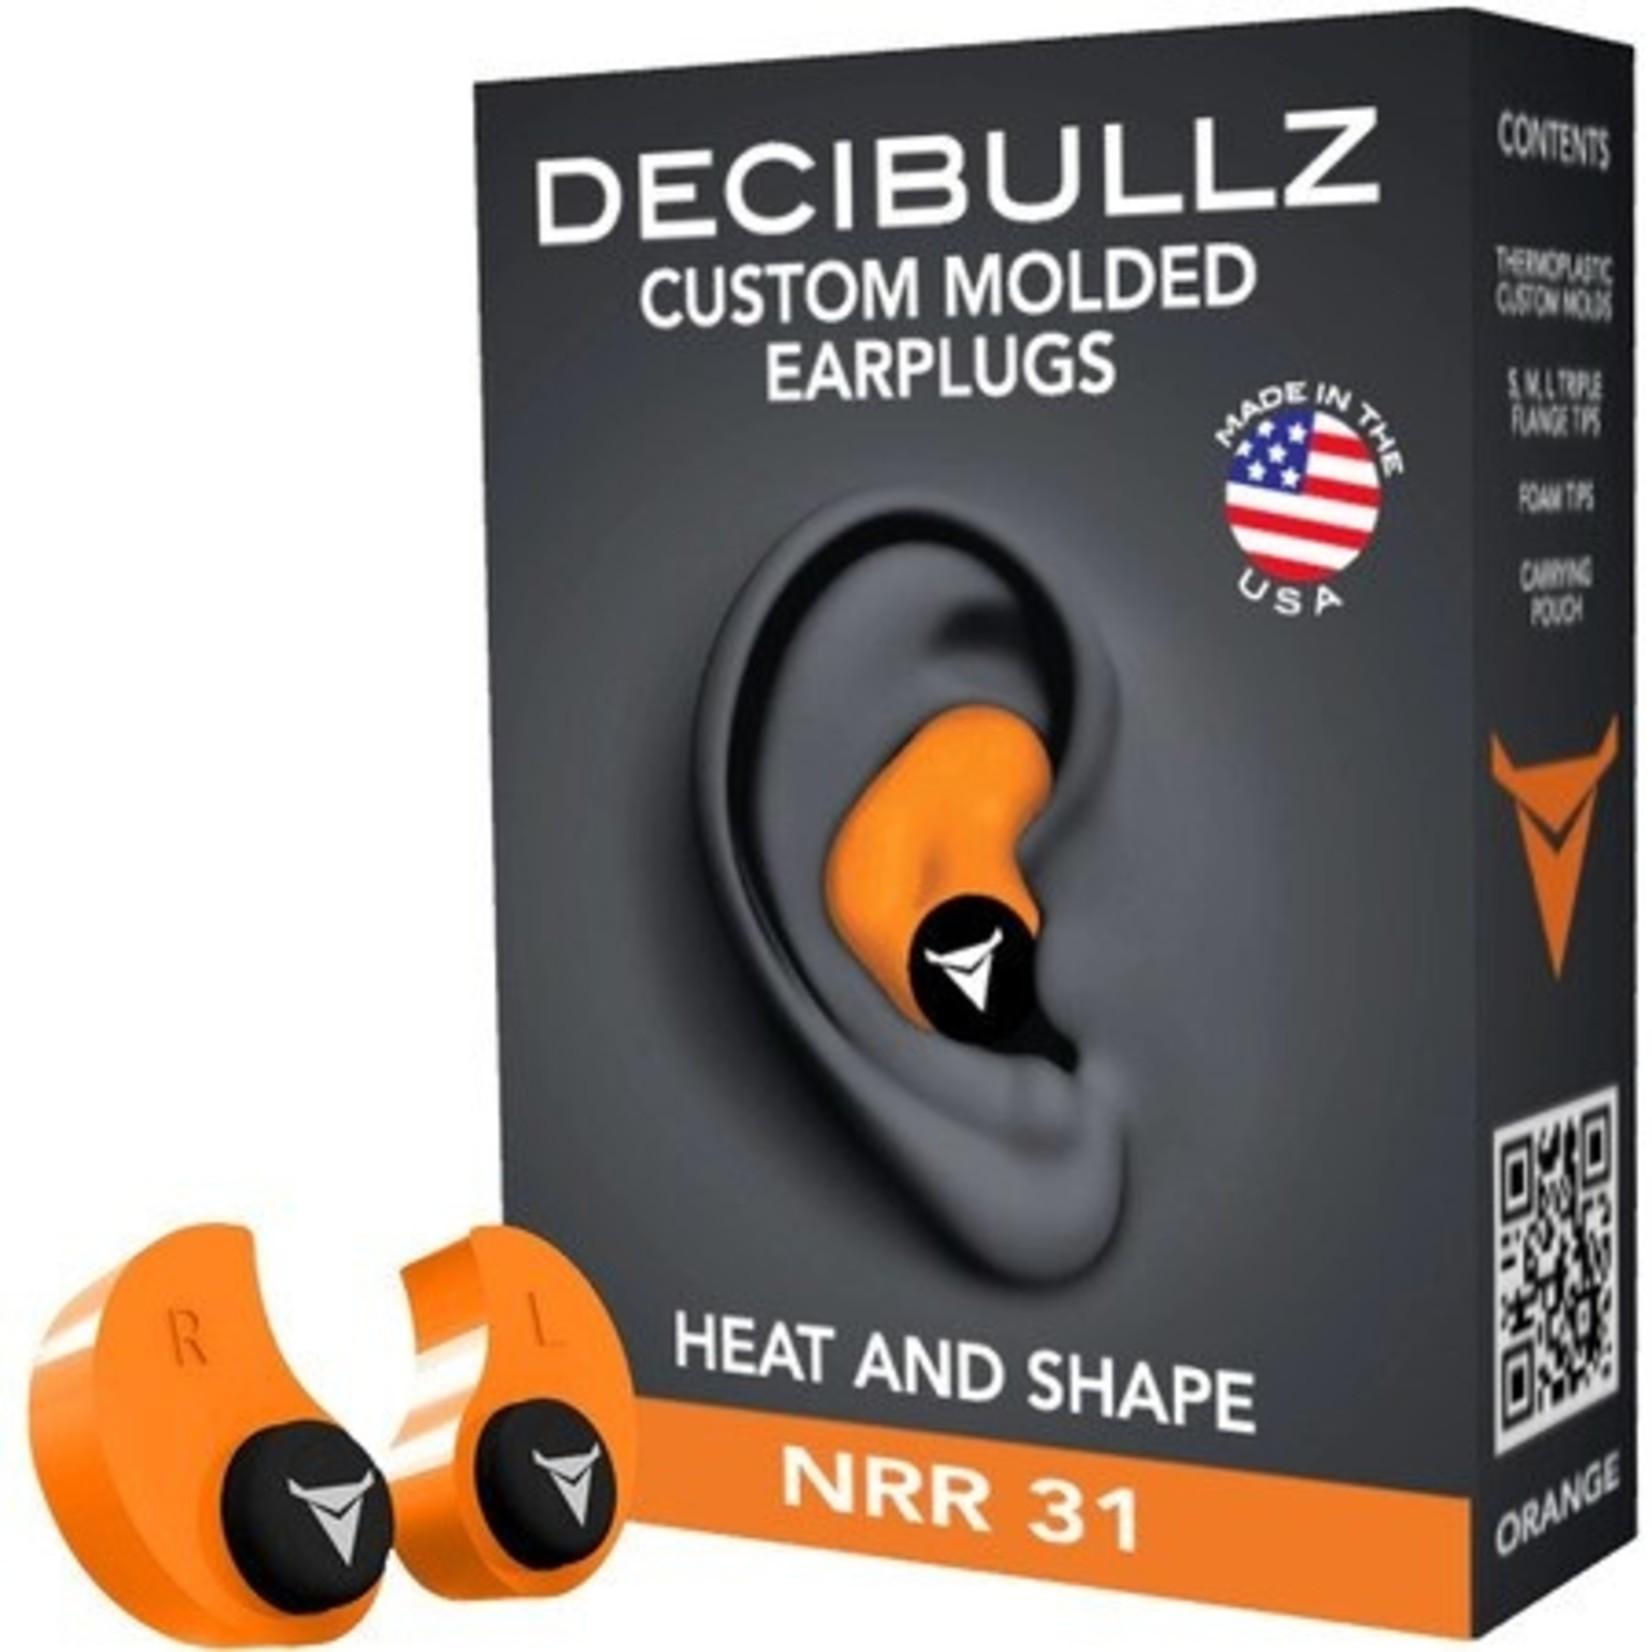 CUSTOM MOLDED EAR PLUGS PLG1-ORG